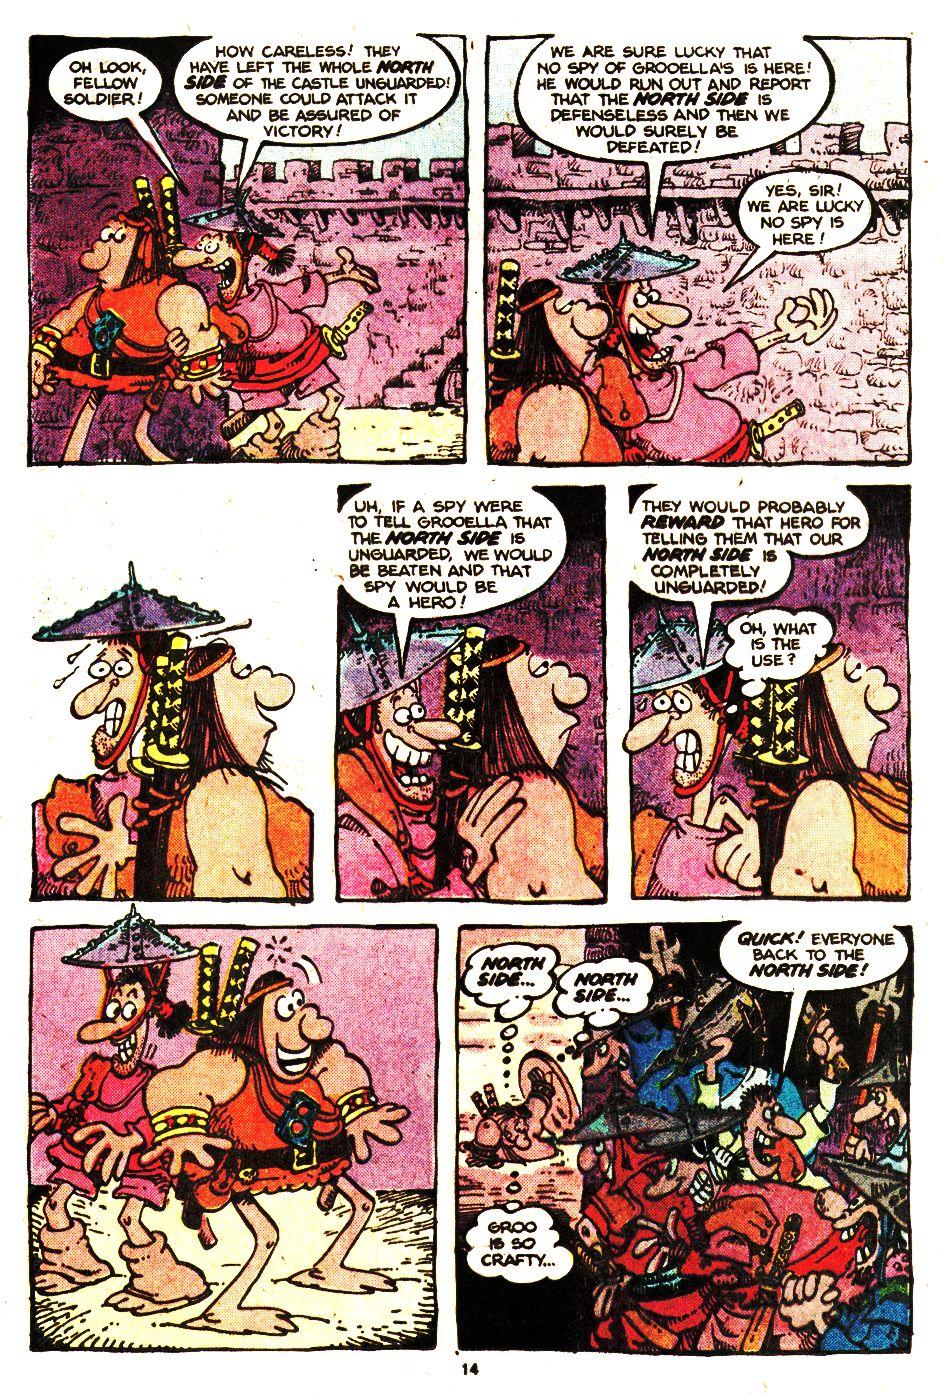 Read online Sergio Aragonés Groo the Wanderer comic -  Issue #20 - 14